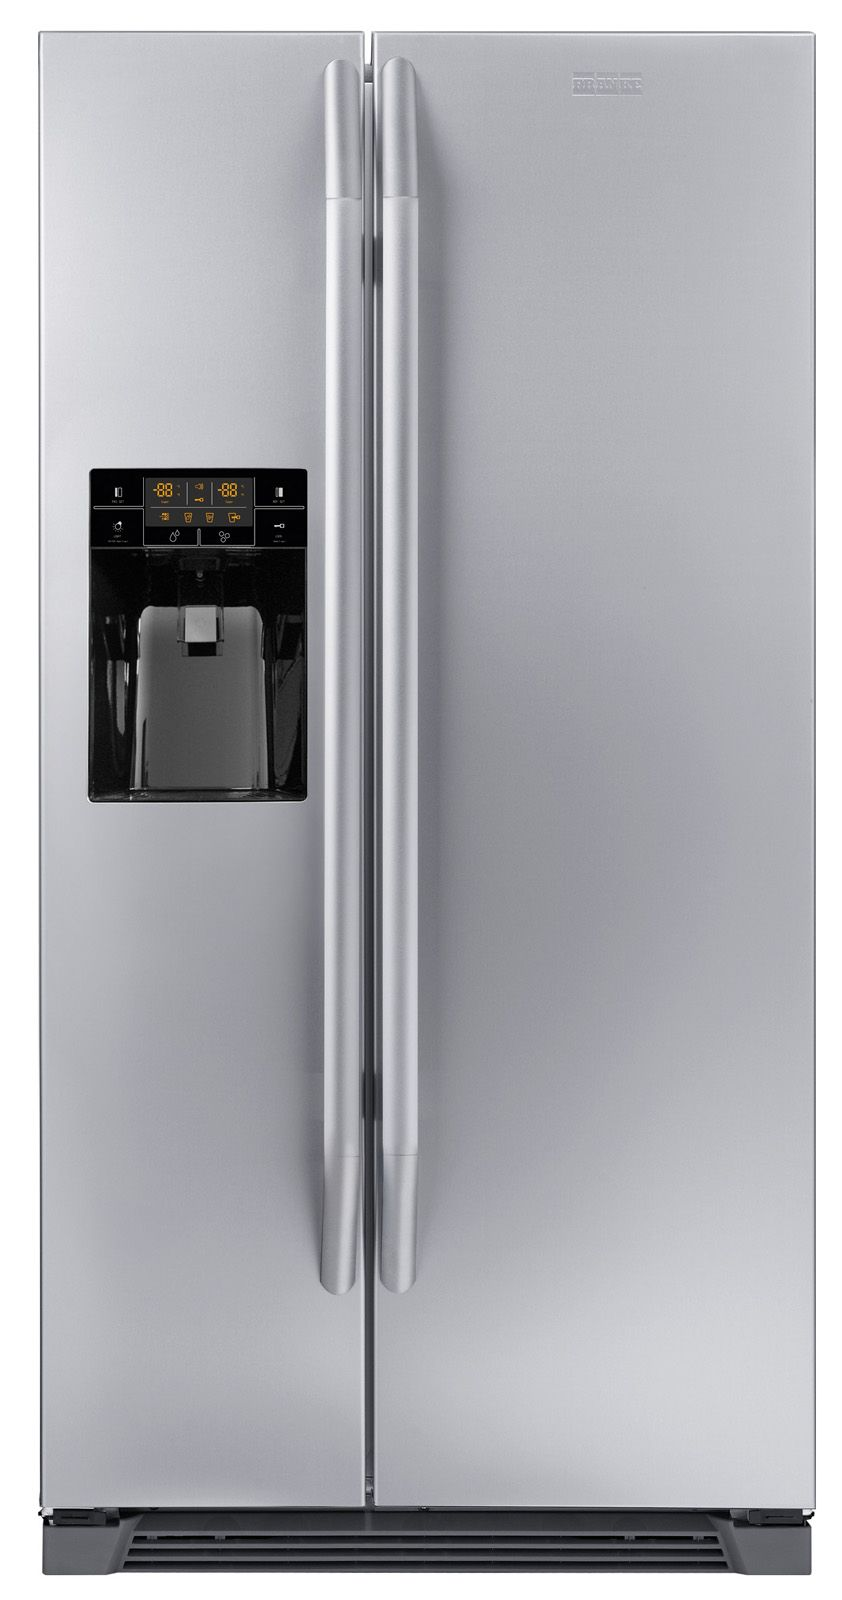 Frigo Americano Misure : Side by il frigorifero fsbs nf iwd xs a di